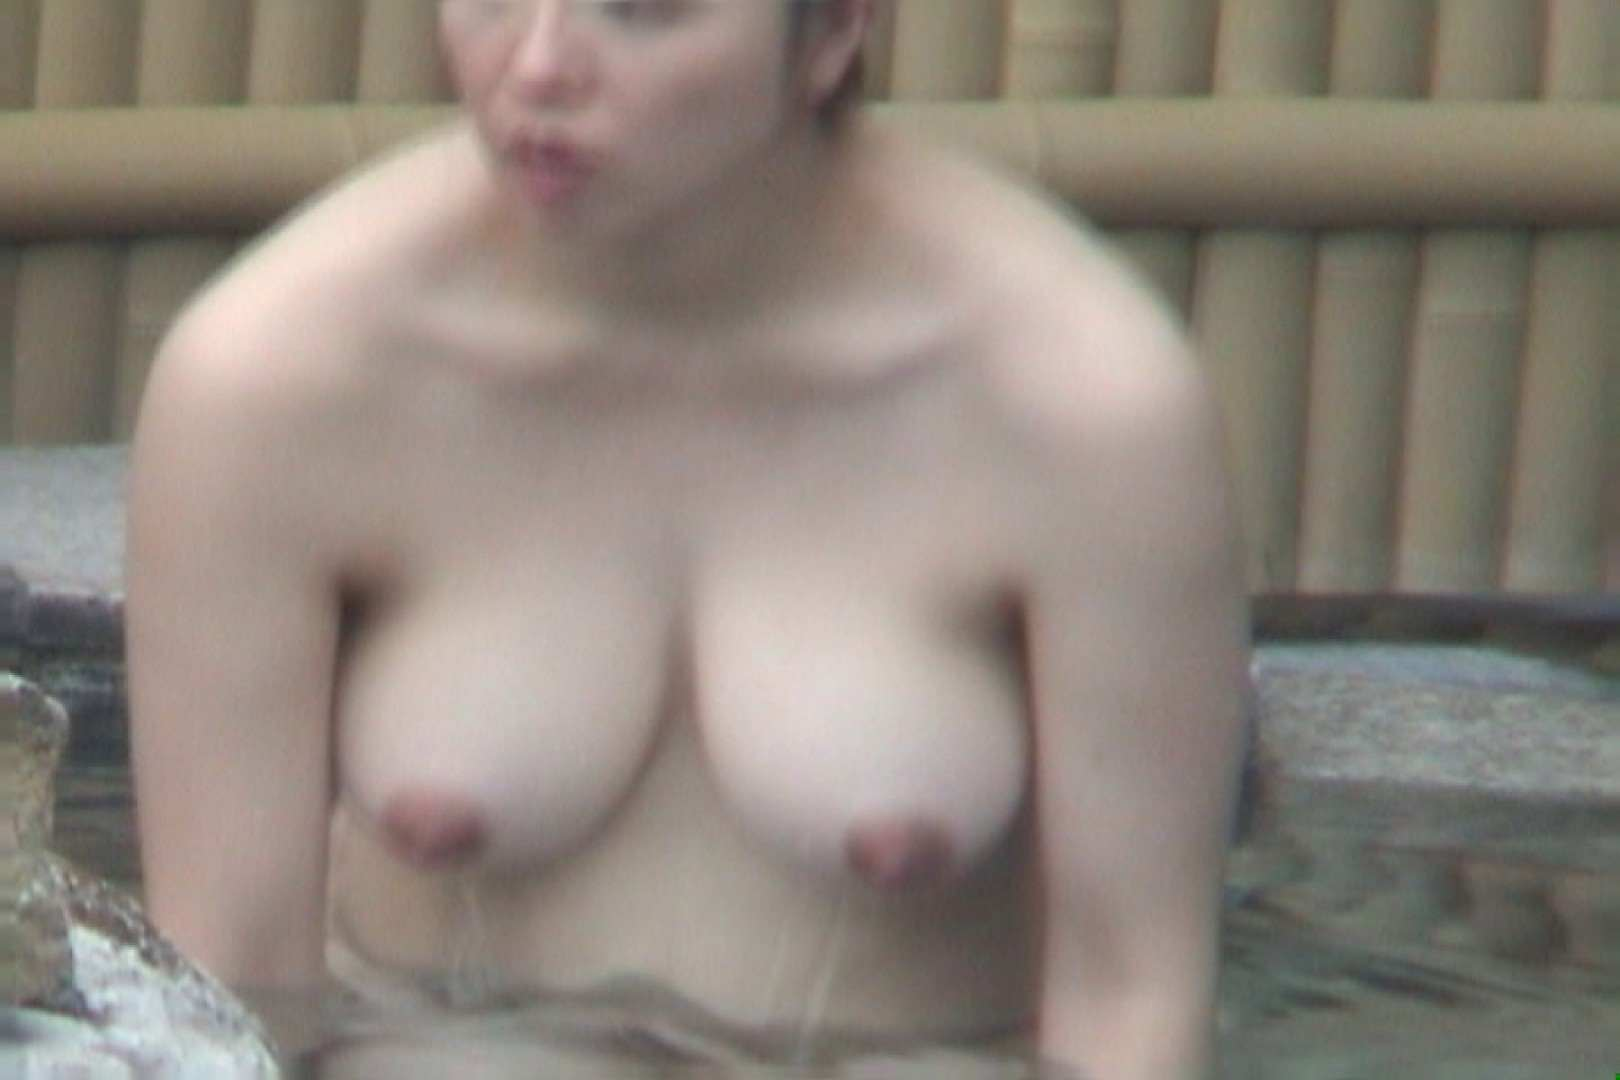 Aquaな露天風呂Vol.573 いやらしいOL SEX無修正画像 85連発 12